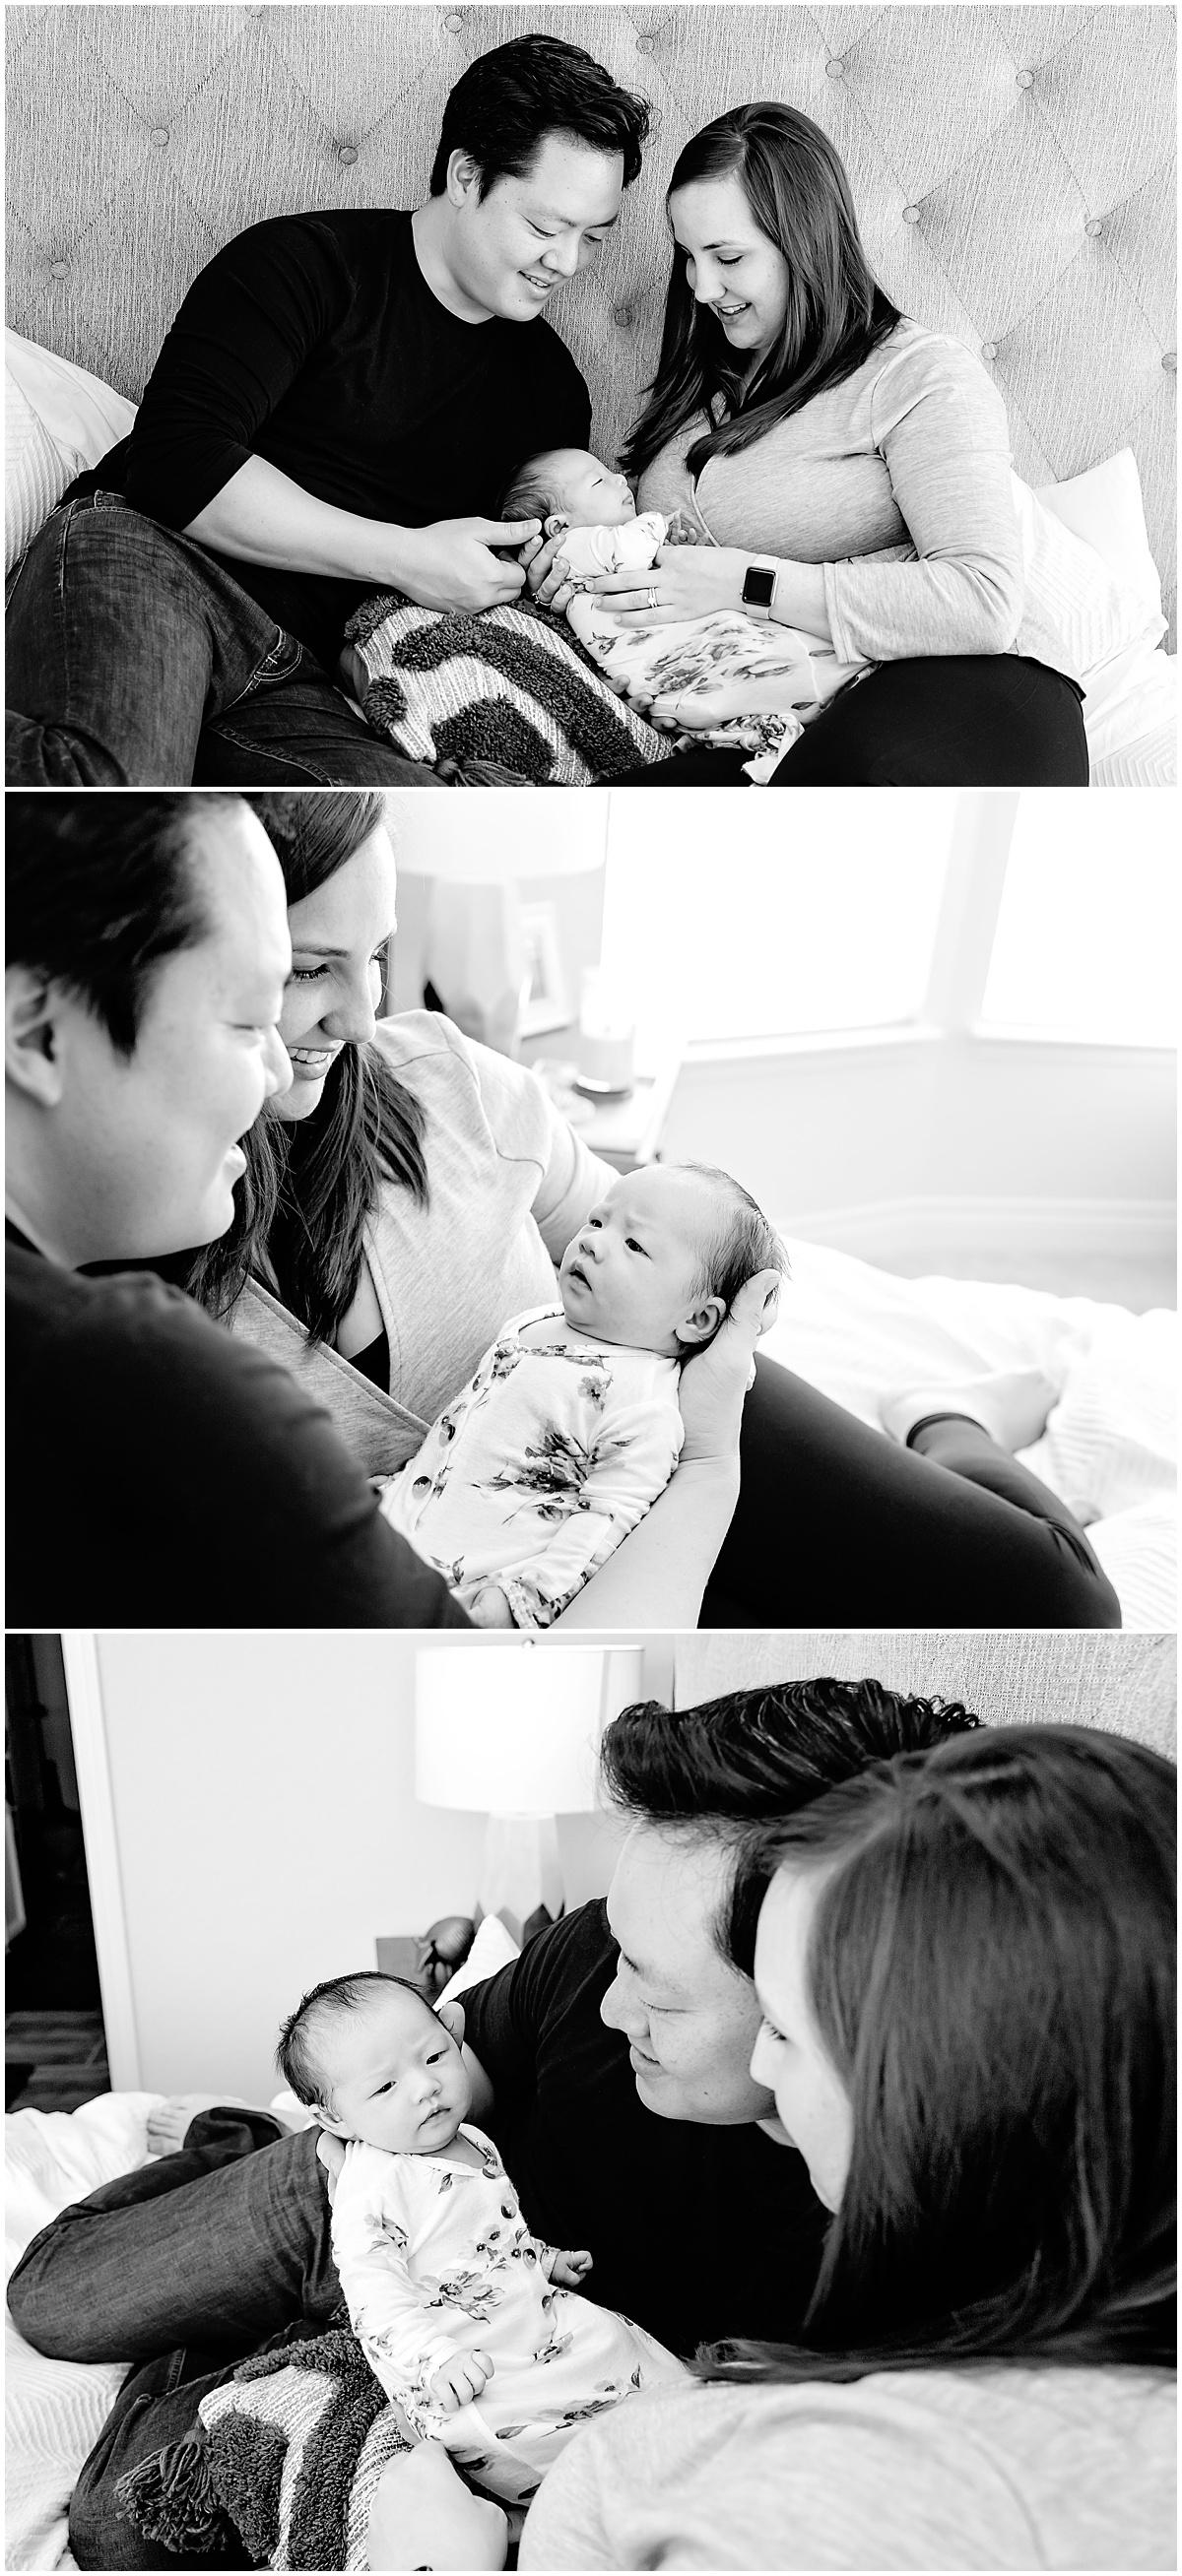 Lifestyle-newborn-family-photos-san-antonio-texas-carly-barton-photography_0013.jpg